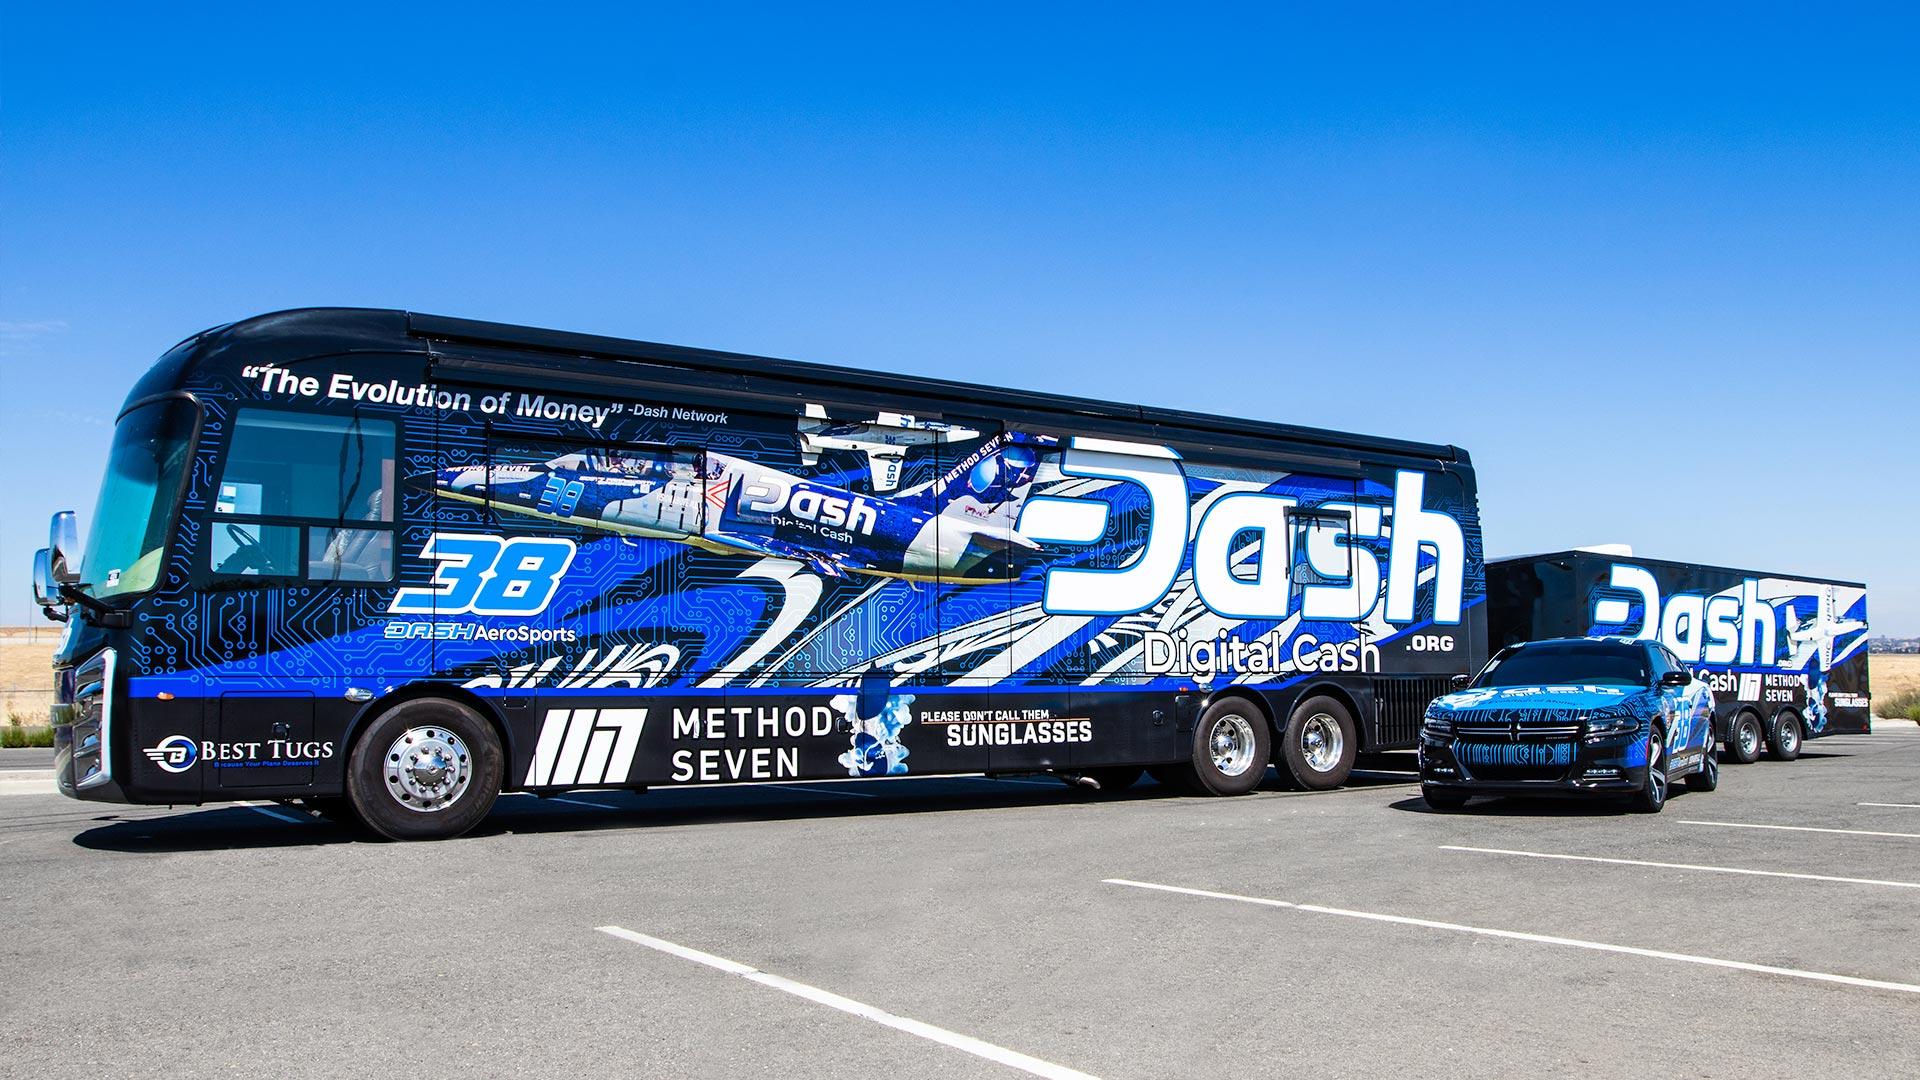 Dash AeroSports Digital Cash Fleet Wrap - Vehicle Wraps